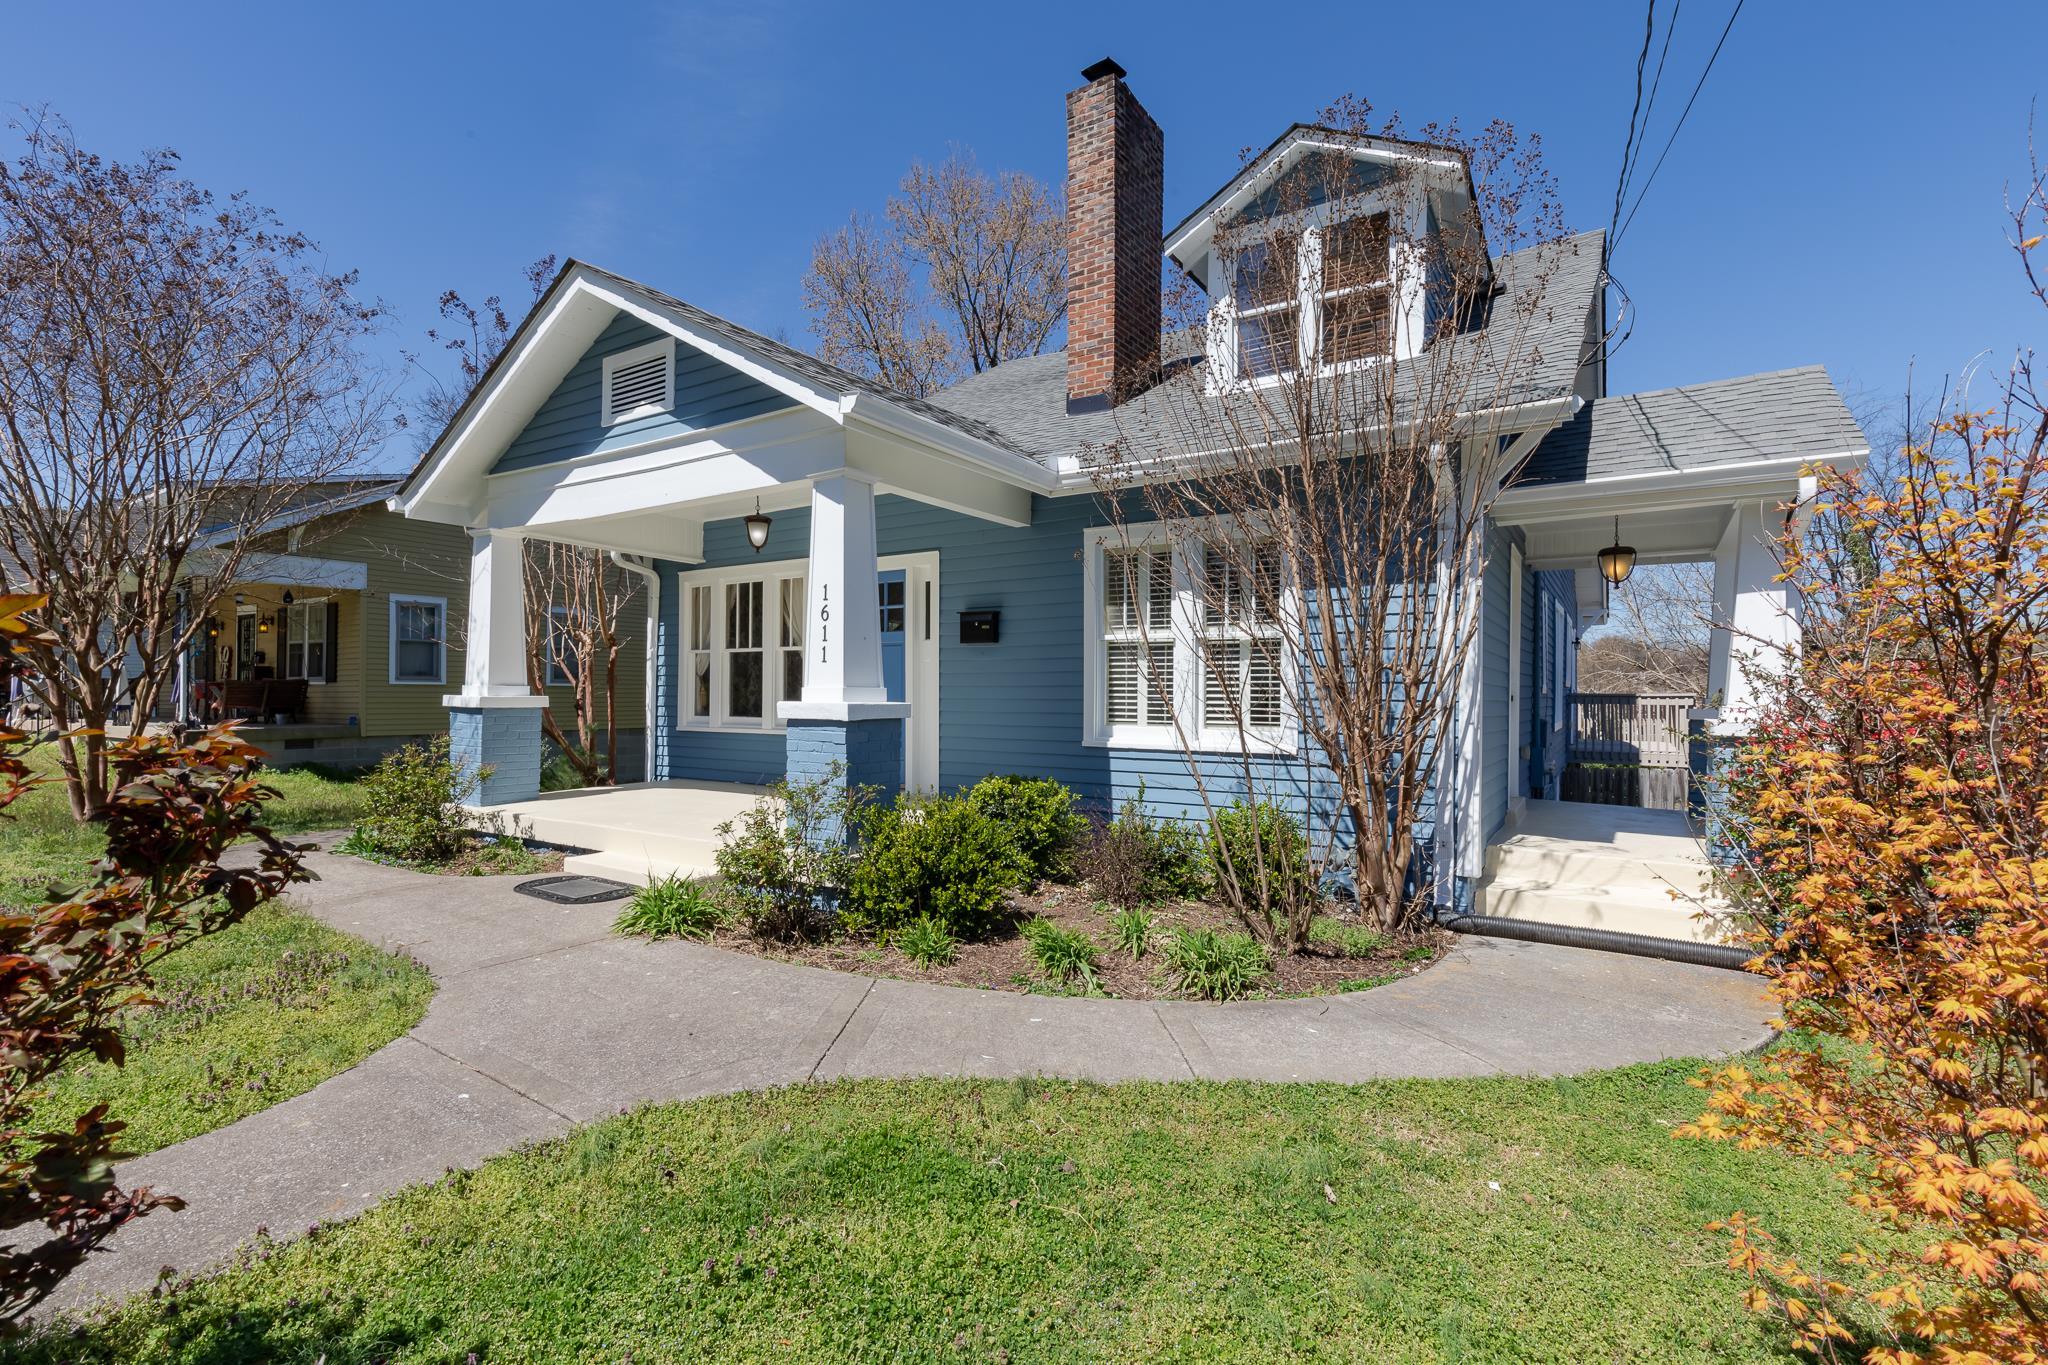 1611 Shelby Ave, Nashville, TN 37206 - Nashville, TN real estate listing